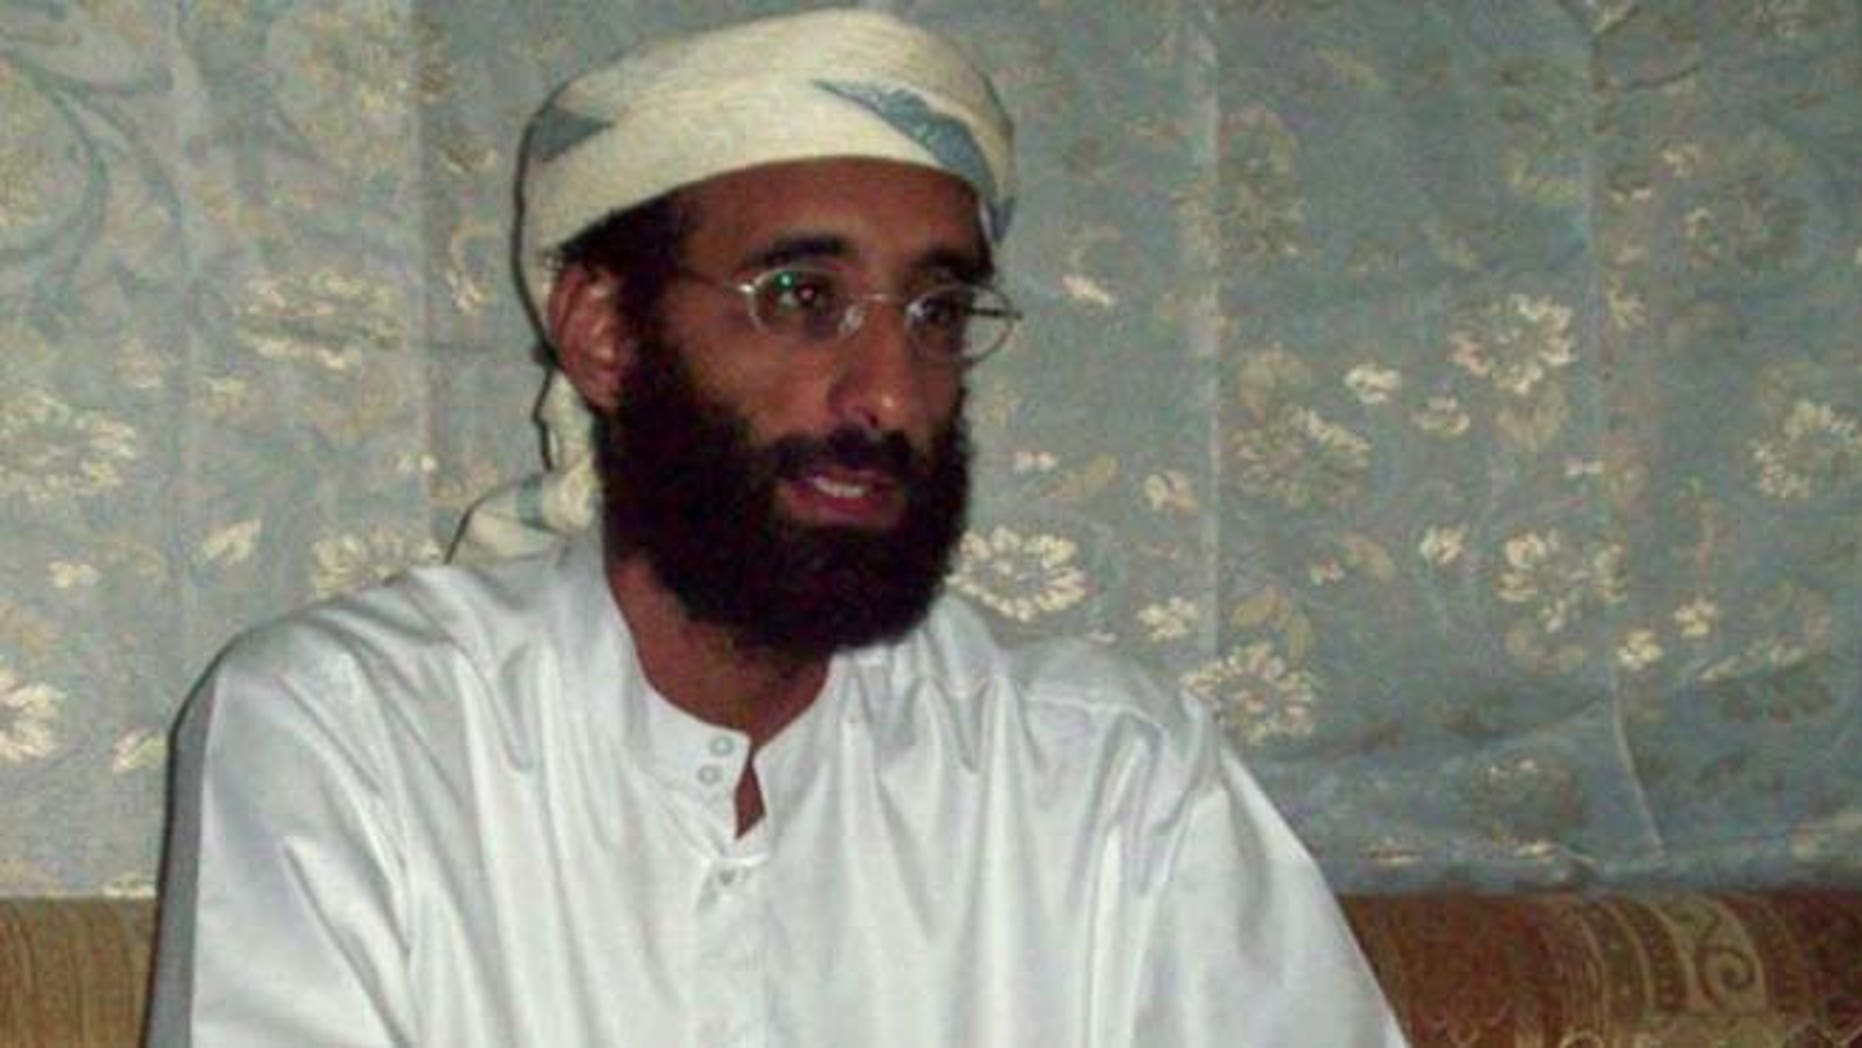 American Muslim cleric Anwar al-Awlaki, seen in this 2008 file photo, was killed by a U.S. drone strike in Yemen in 2011. (AP)